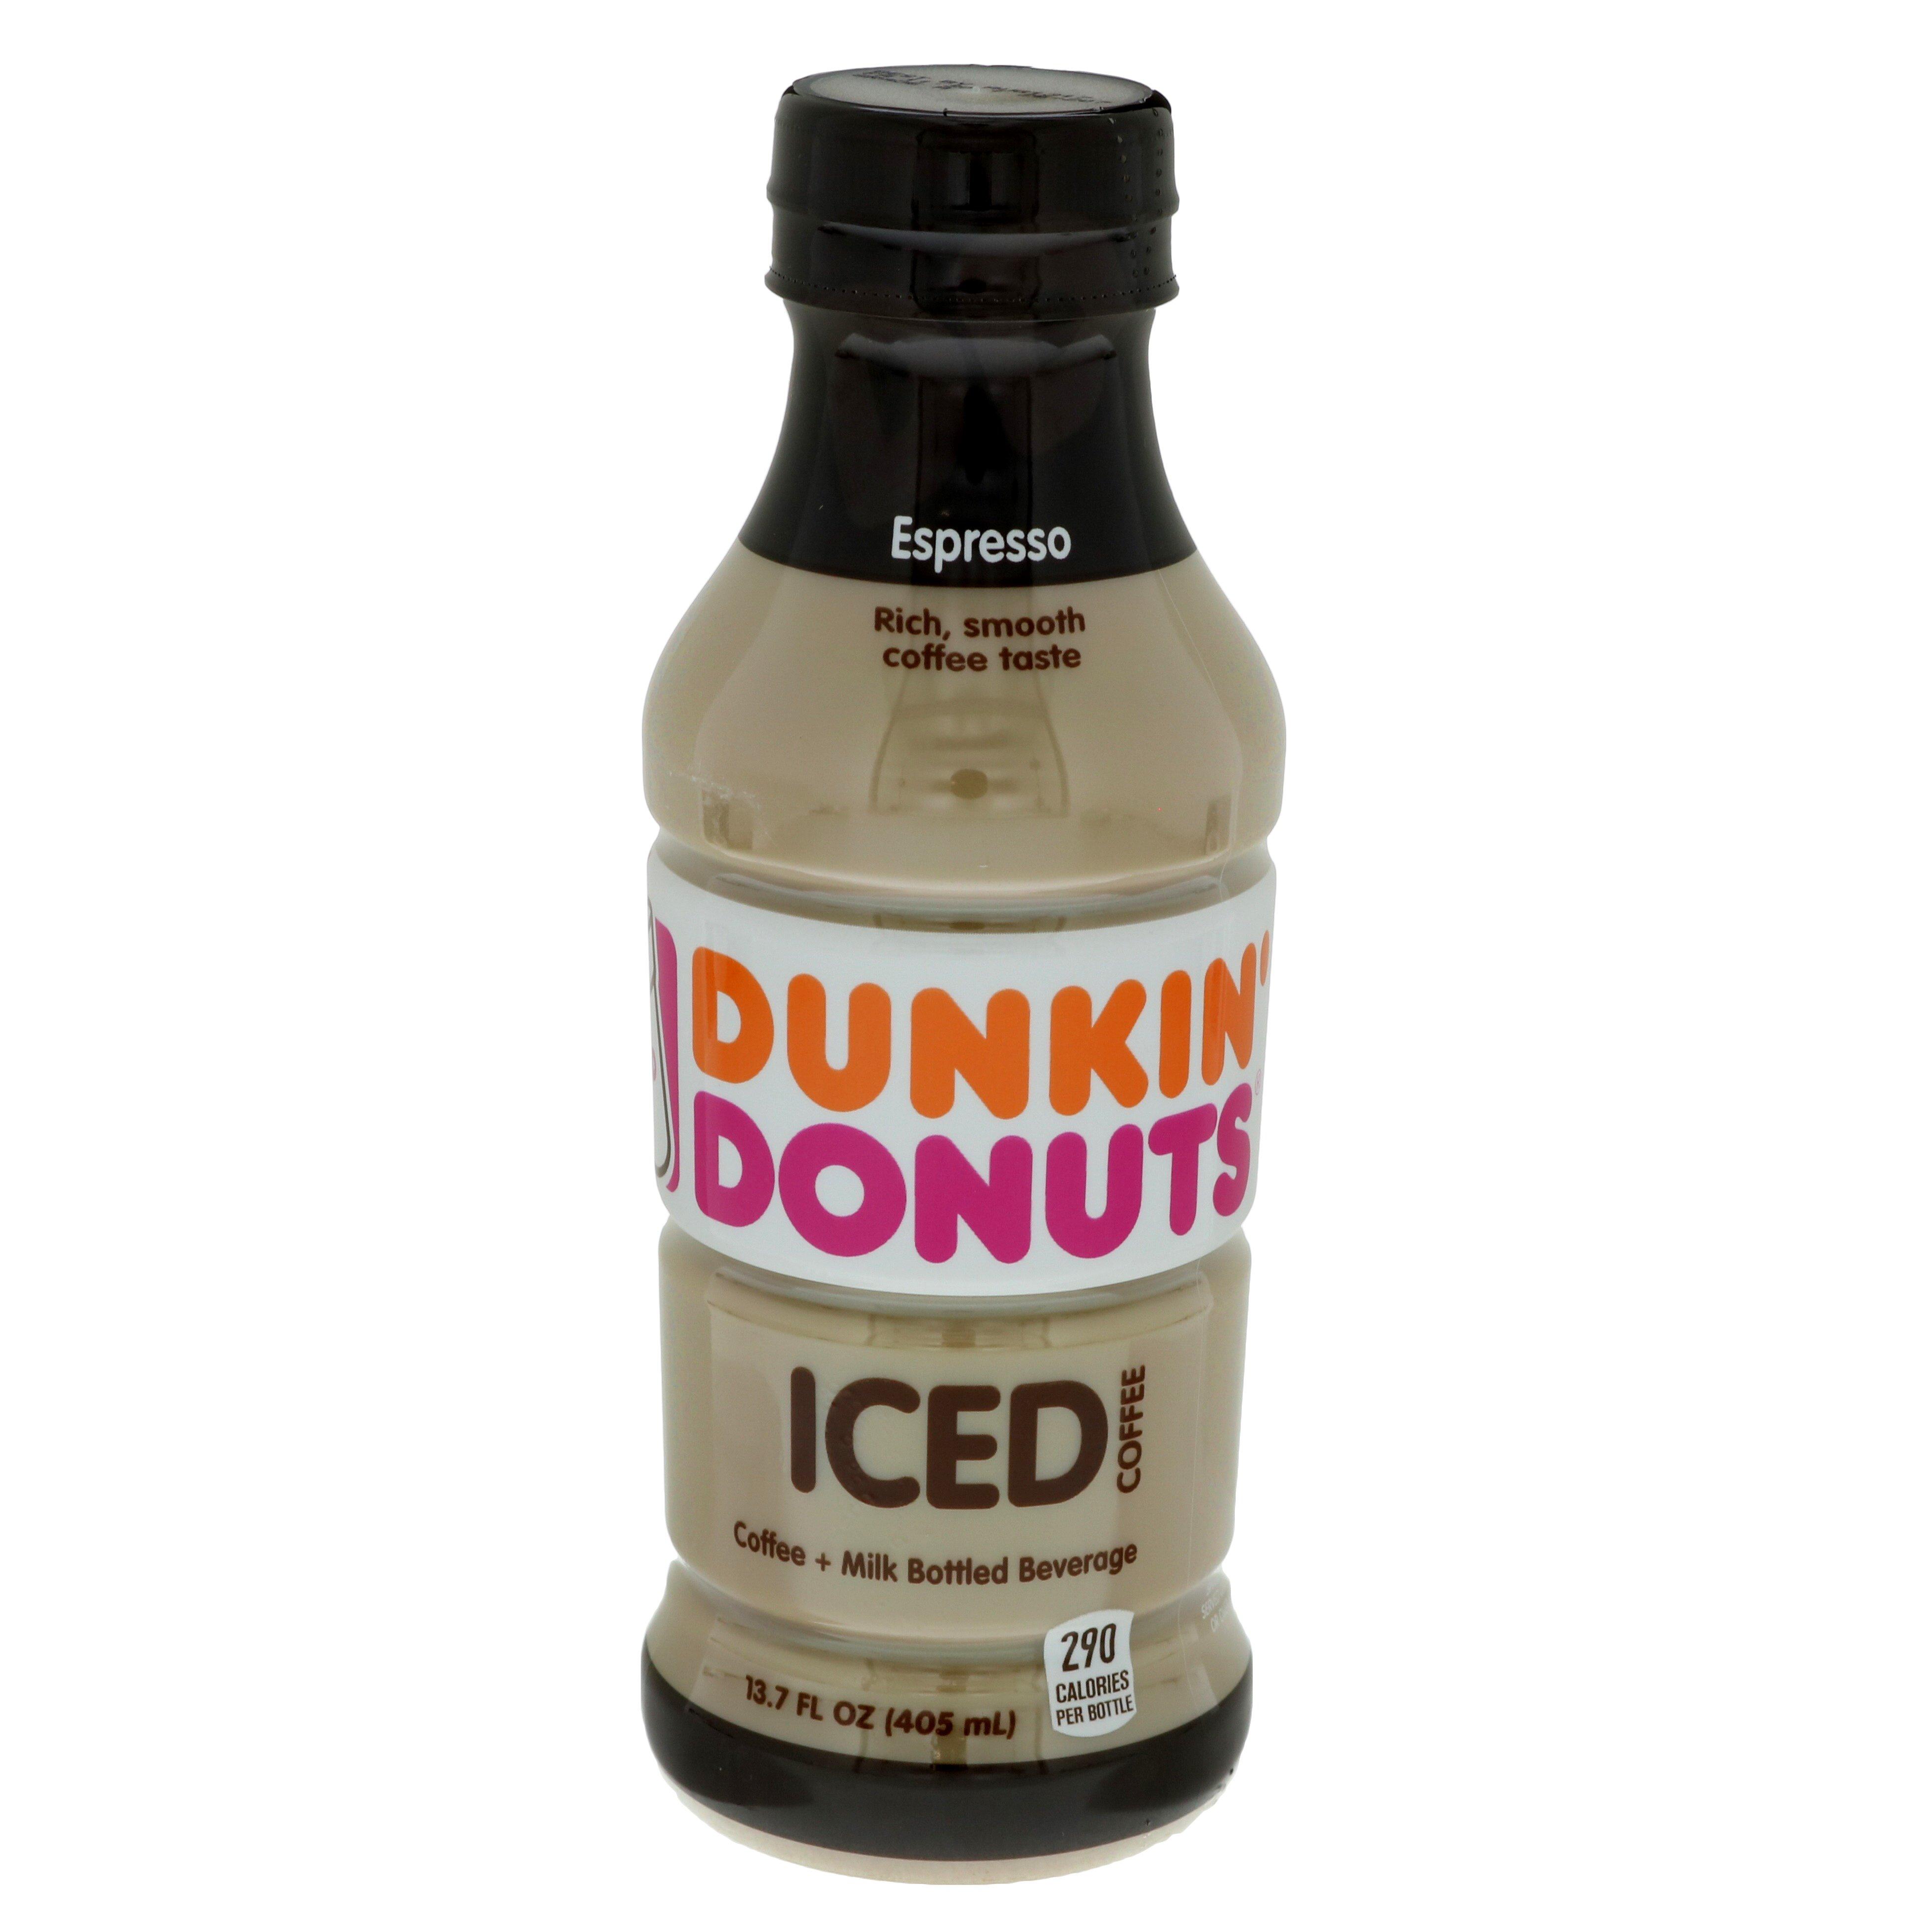 Dunkin' Donuts Espresso Iced Coffee